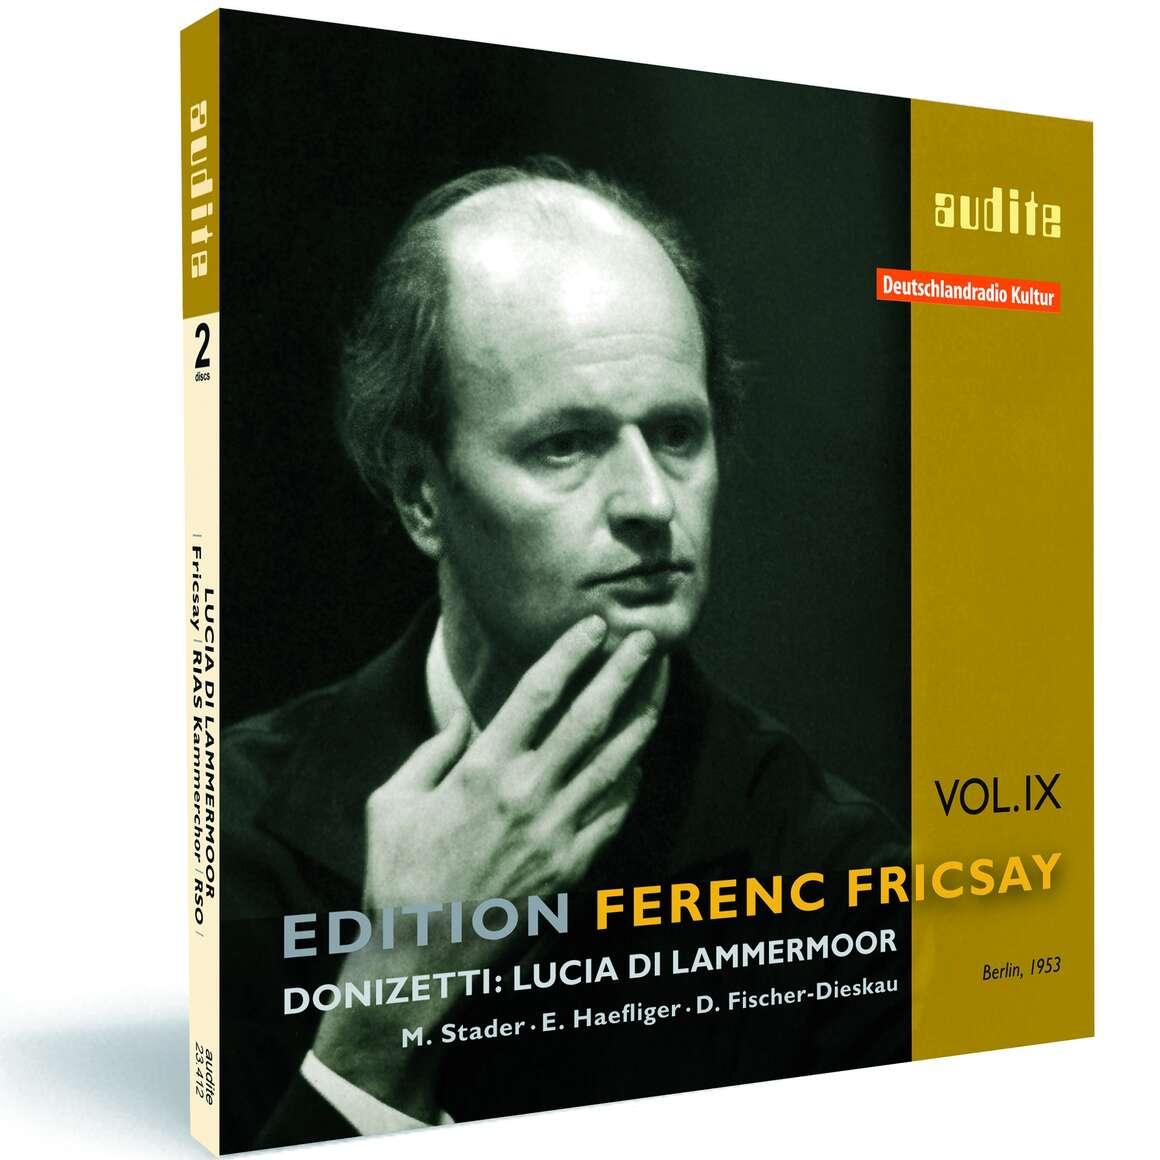 Edition Ferenc Fricsay (IX) – G. Donizetti: Lucia di Lammermoor